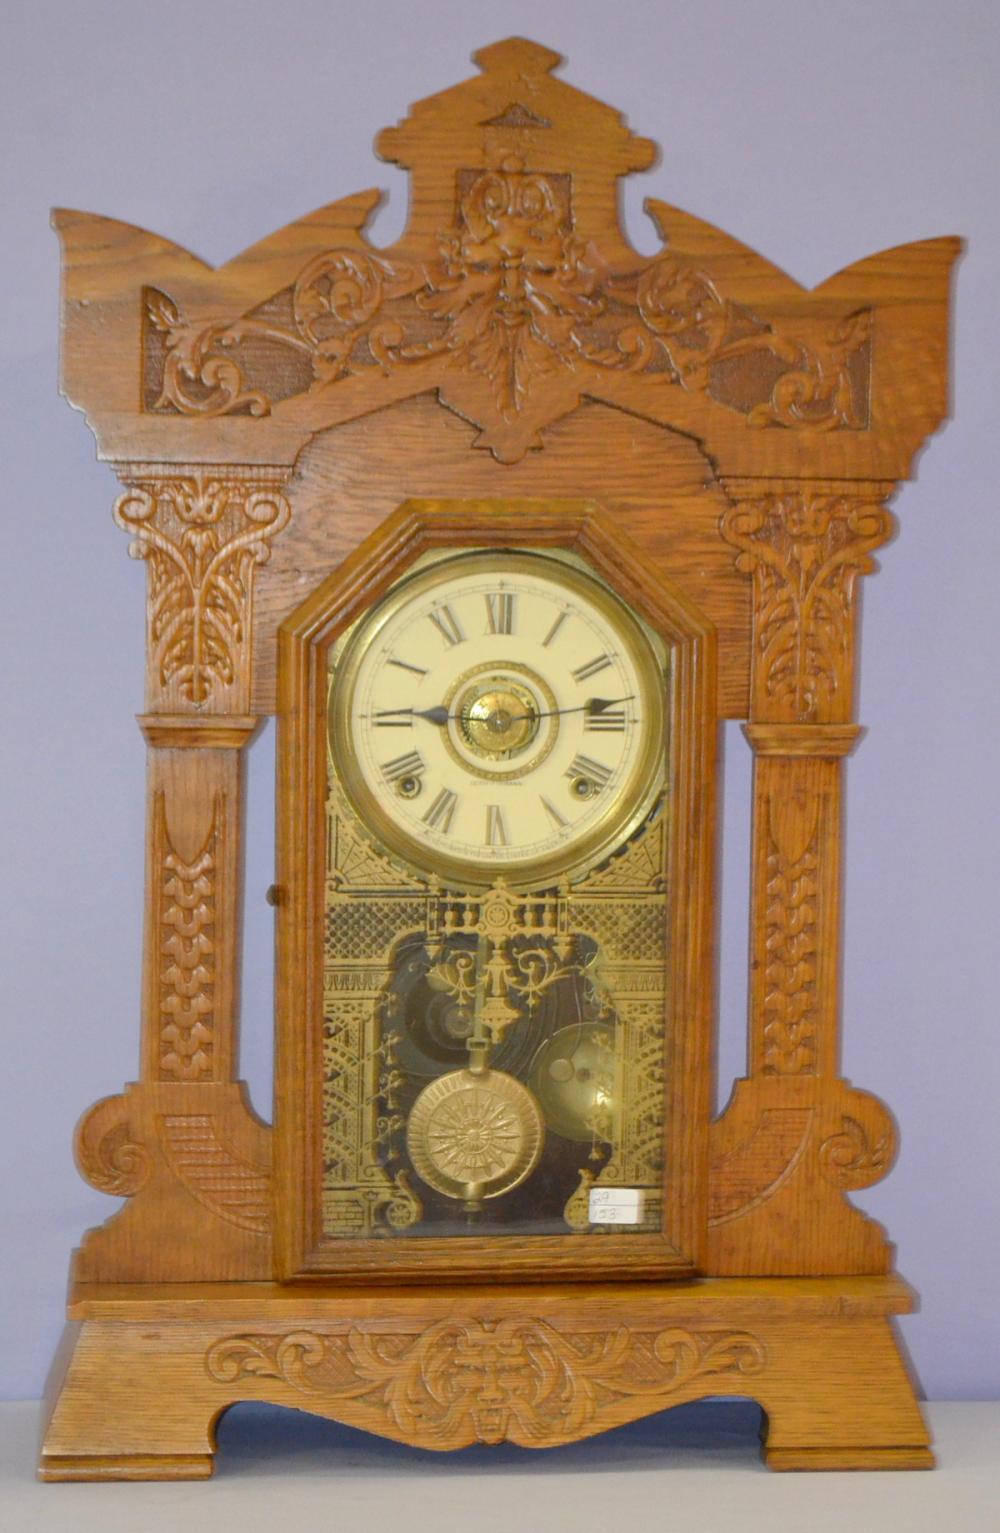 wooden kitchen clock cabinet ideas american clocks for sale at online auction buy rare antique oak seth thomas